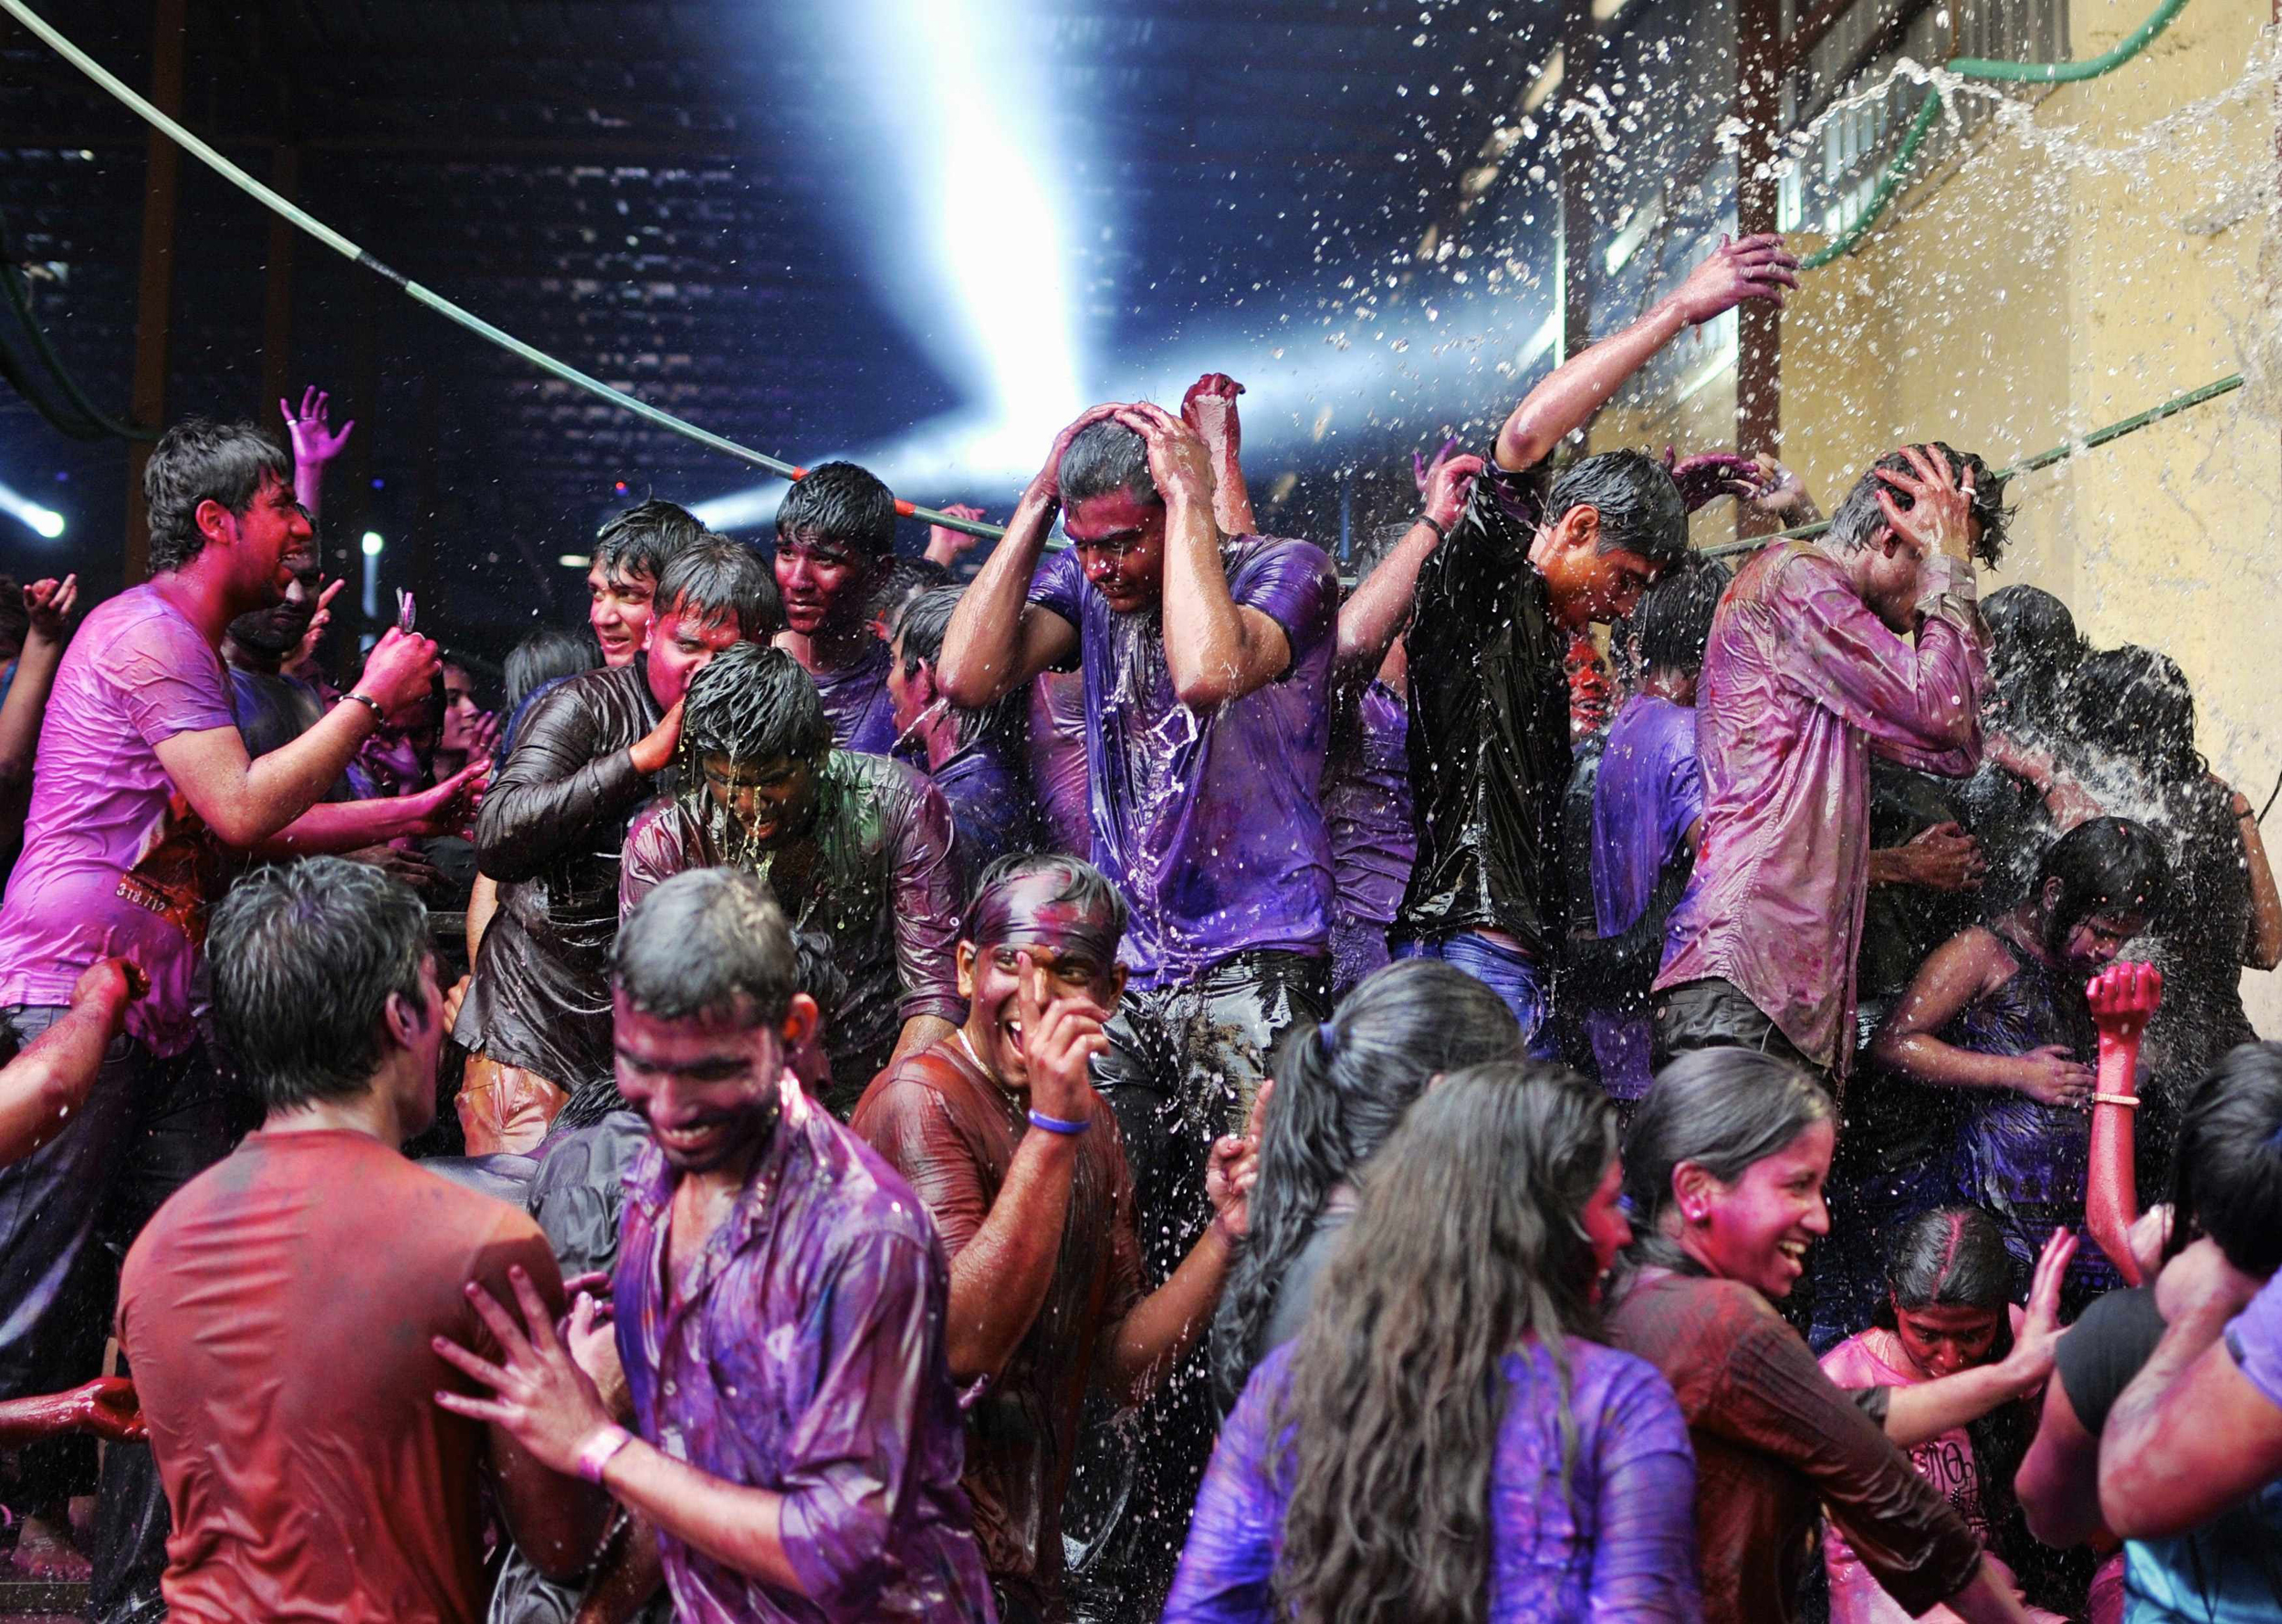 Holi News: Holi Welcomes Spring With Bursts Of Color